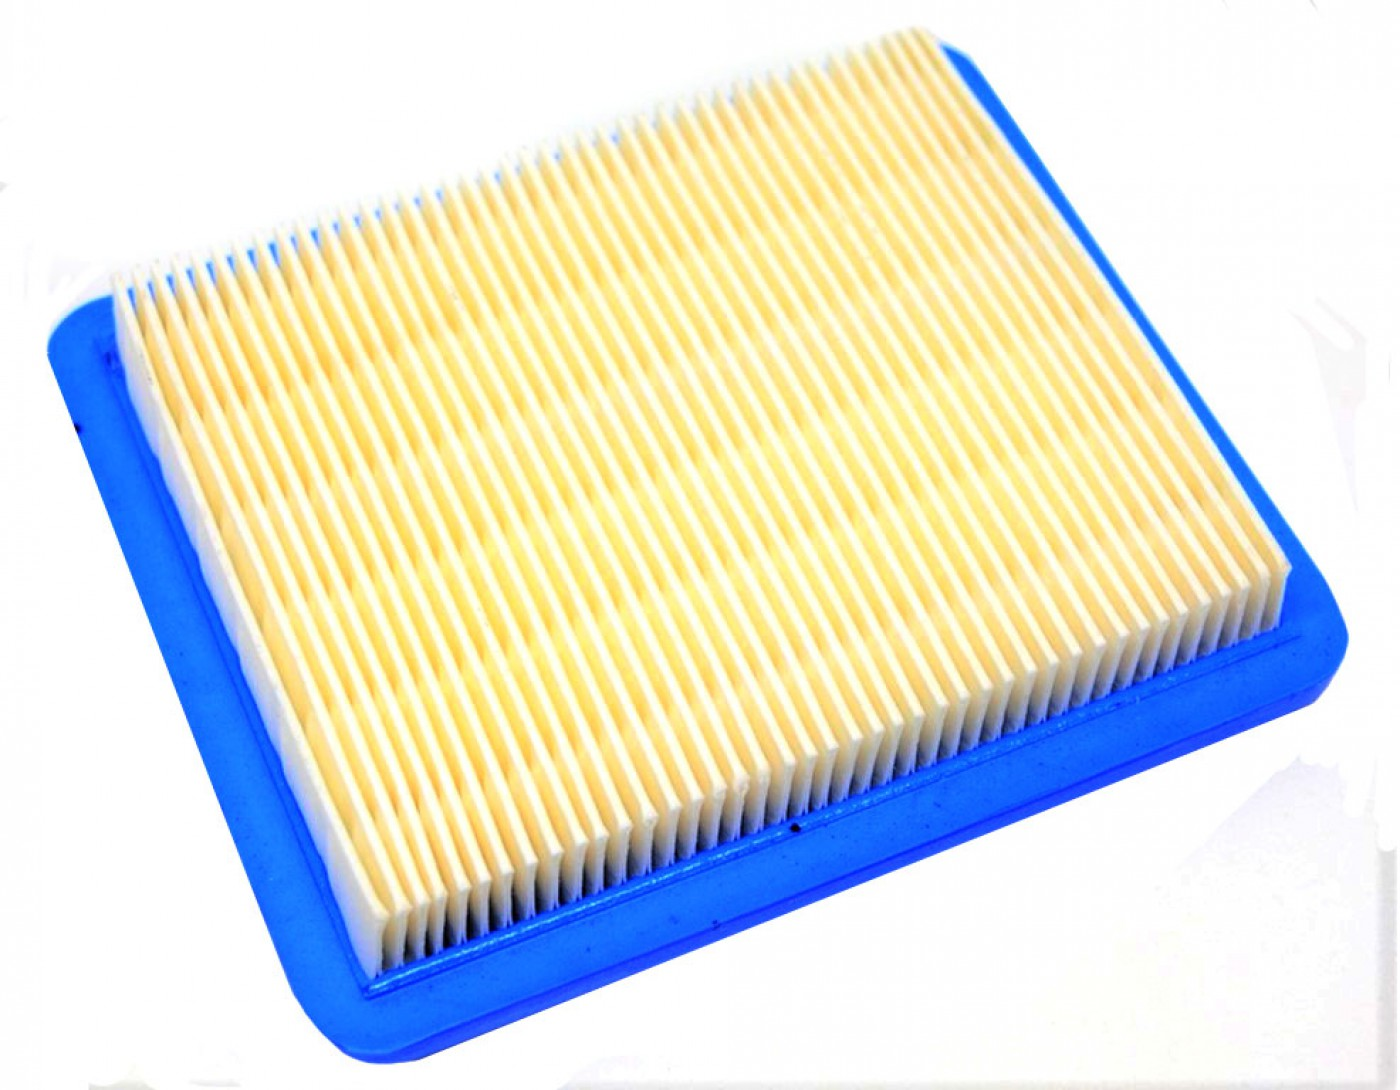 Vzduchový filtr Briggs & Stratton